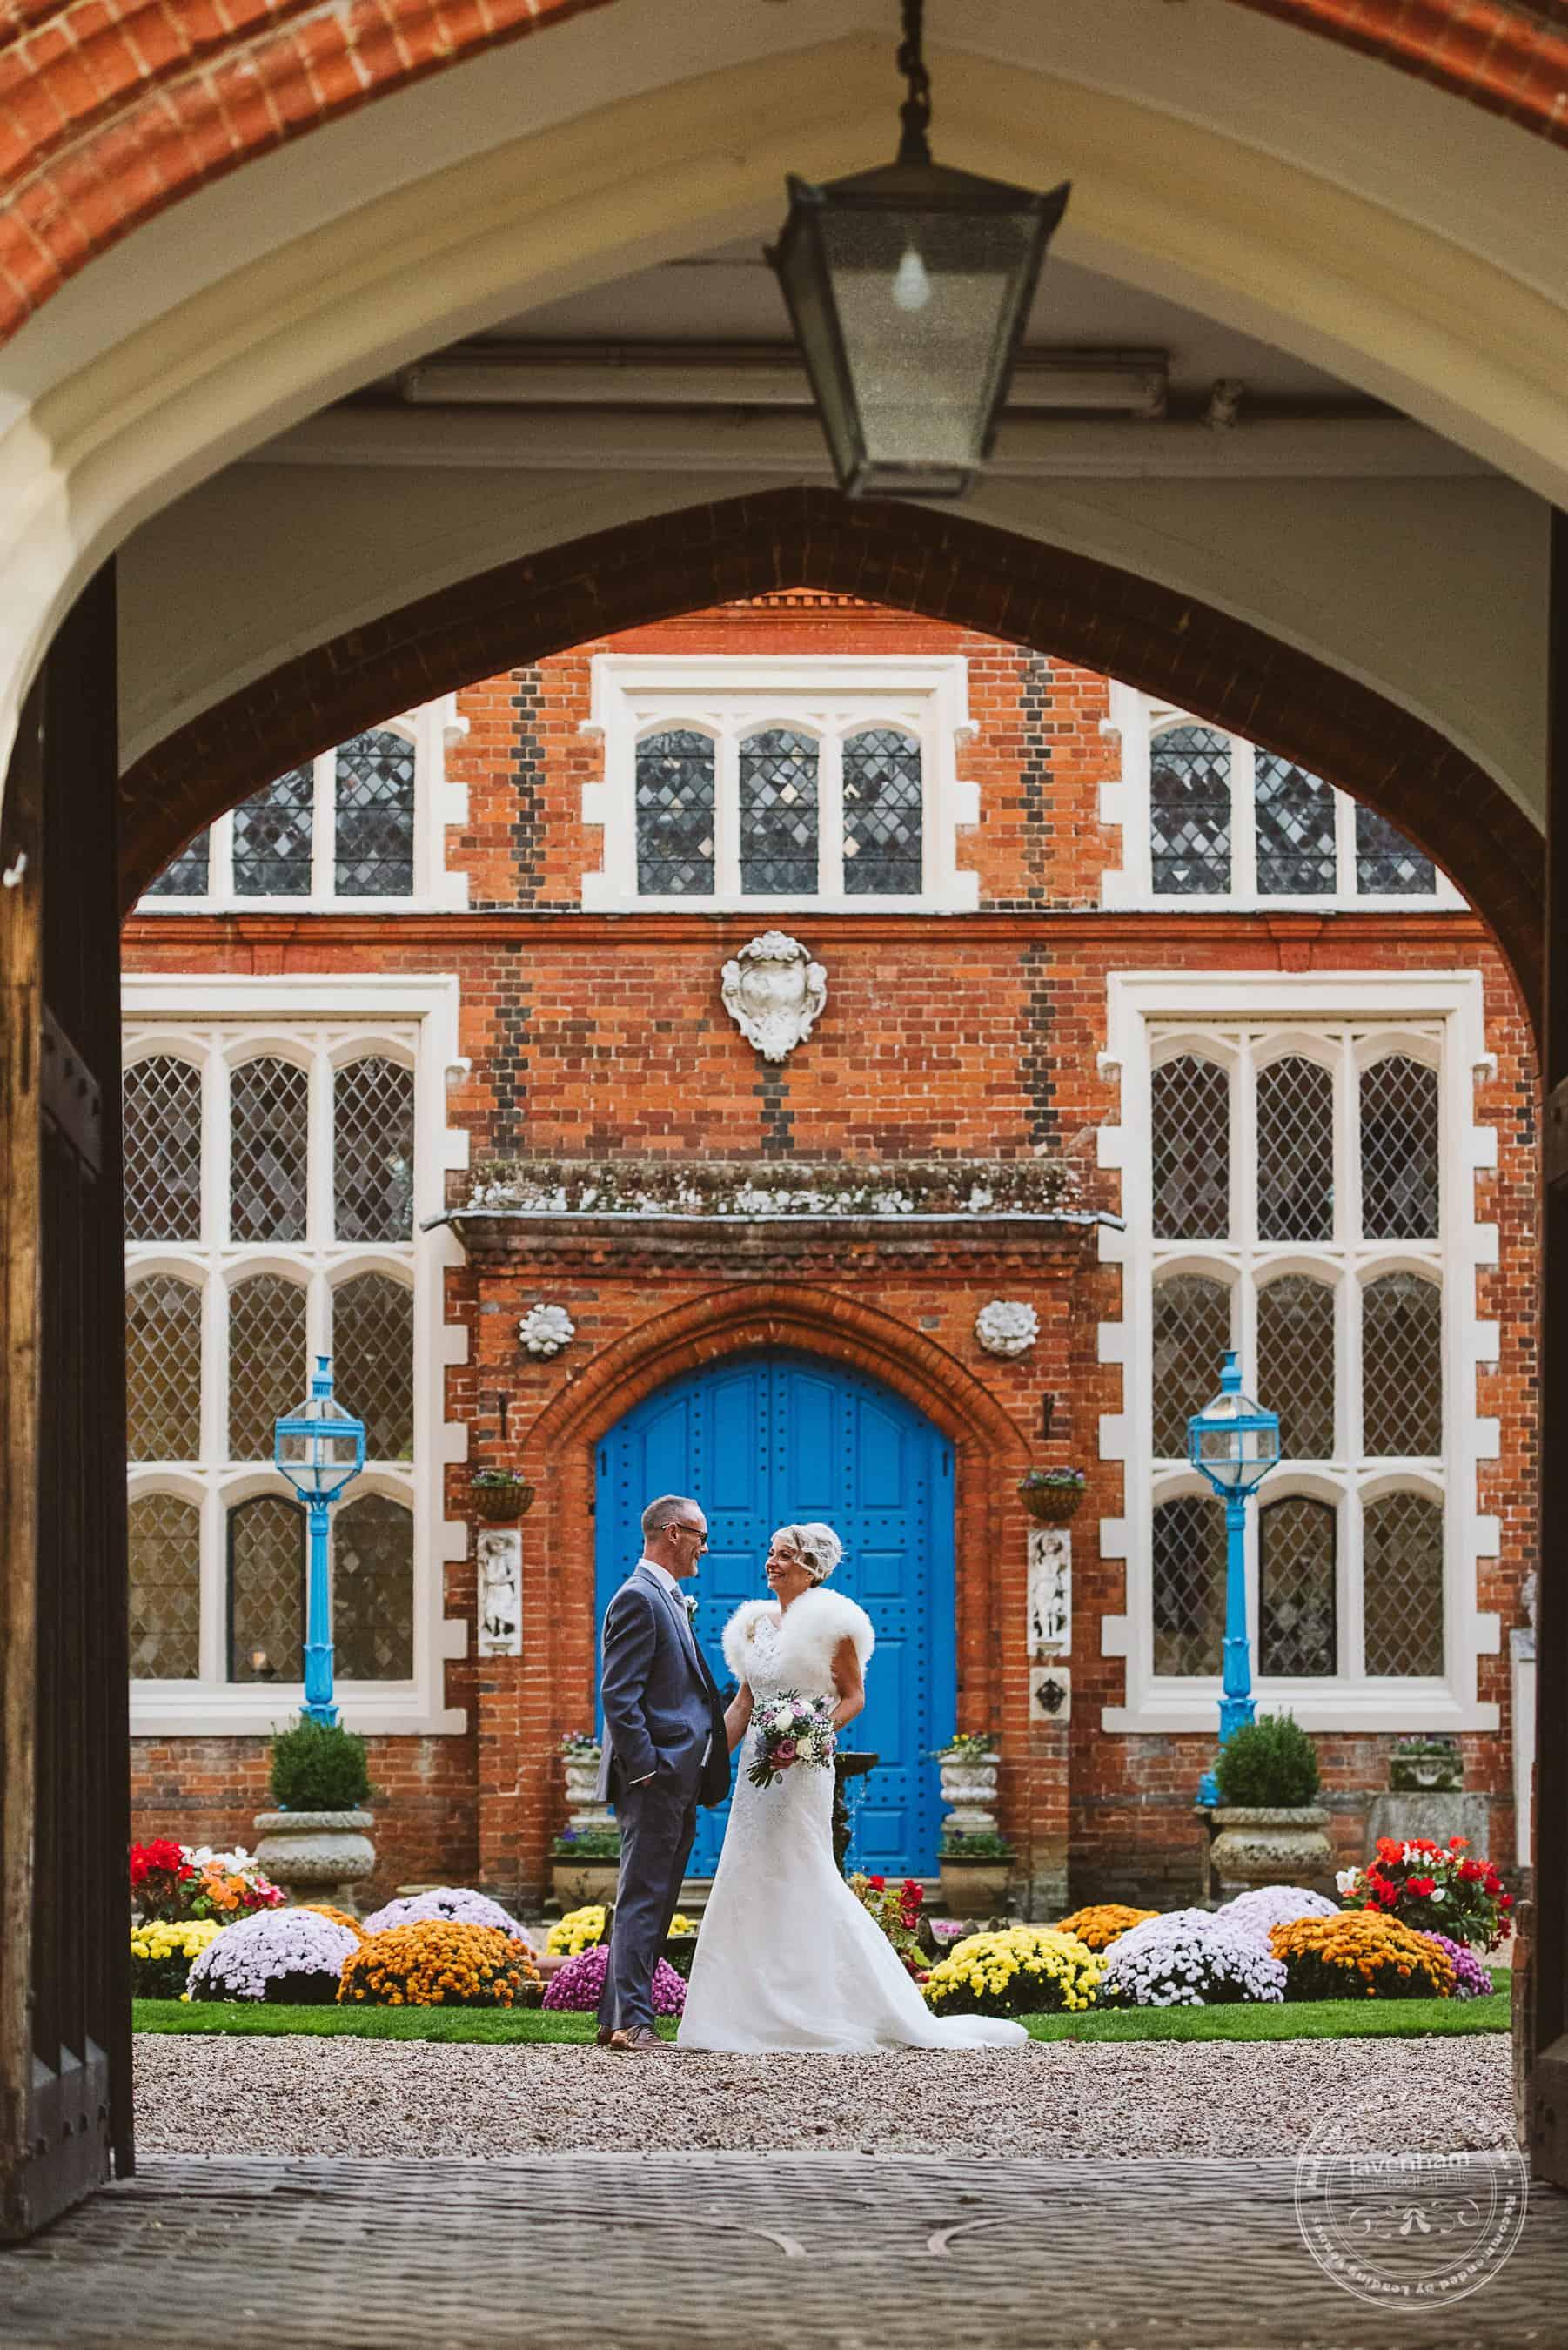 281018 Gosfield Hall Wedding Photography Lavenham Photographic 079